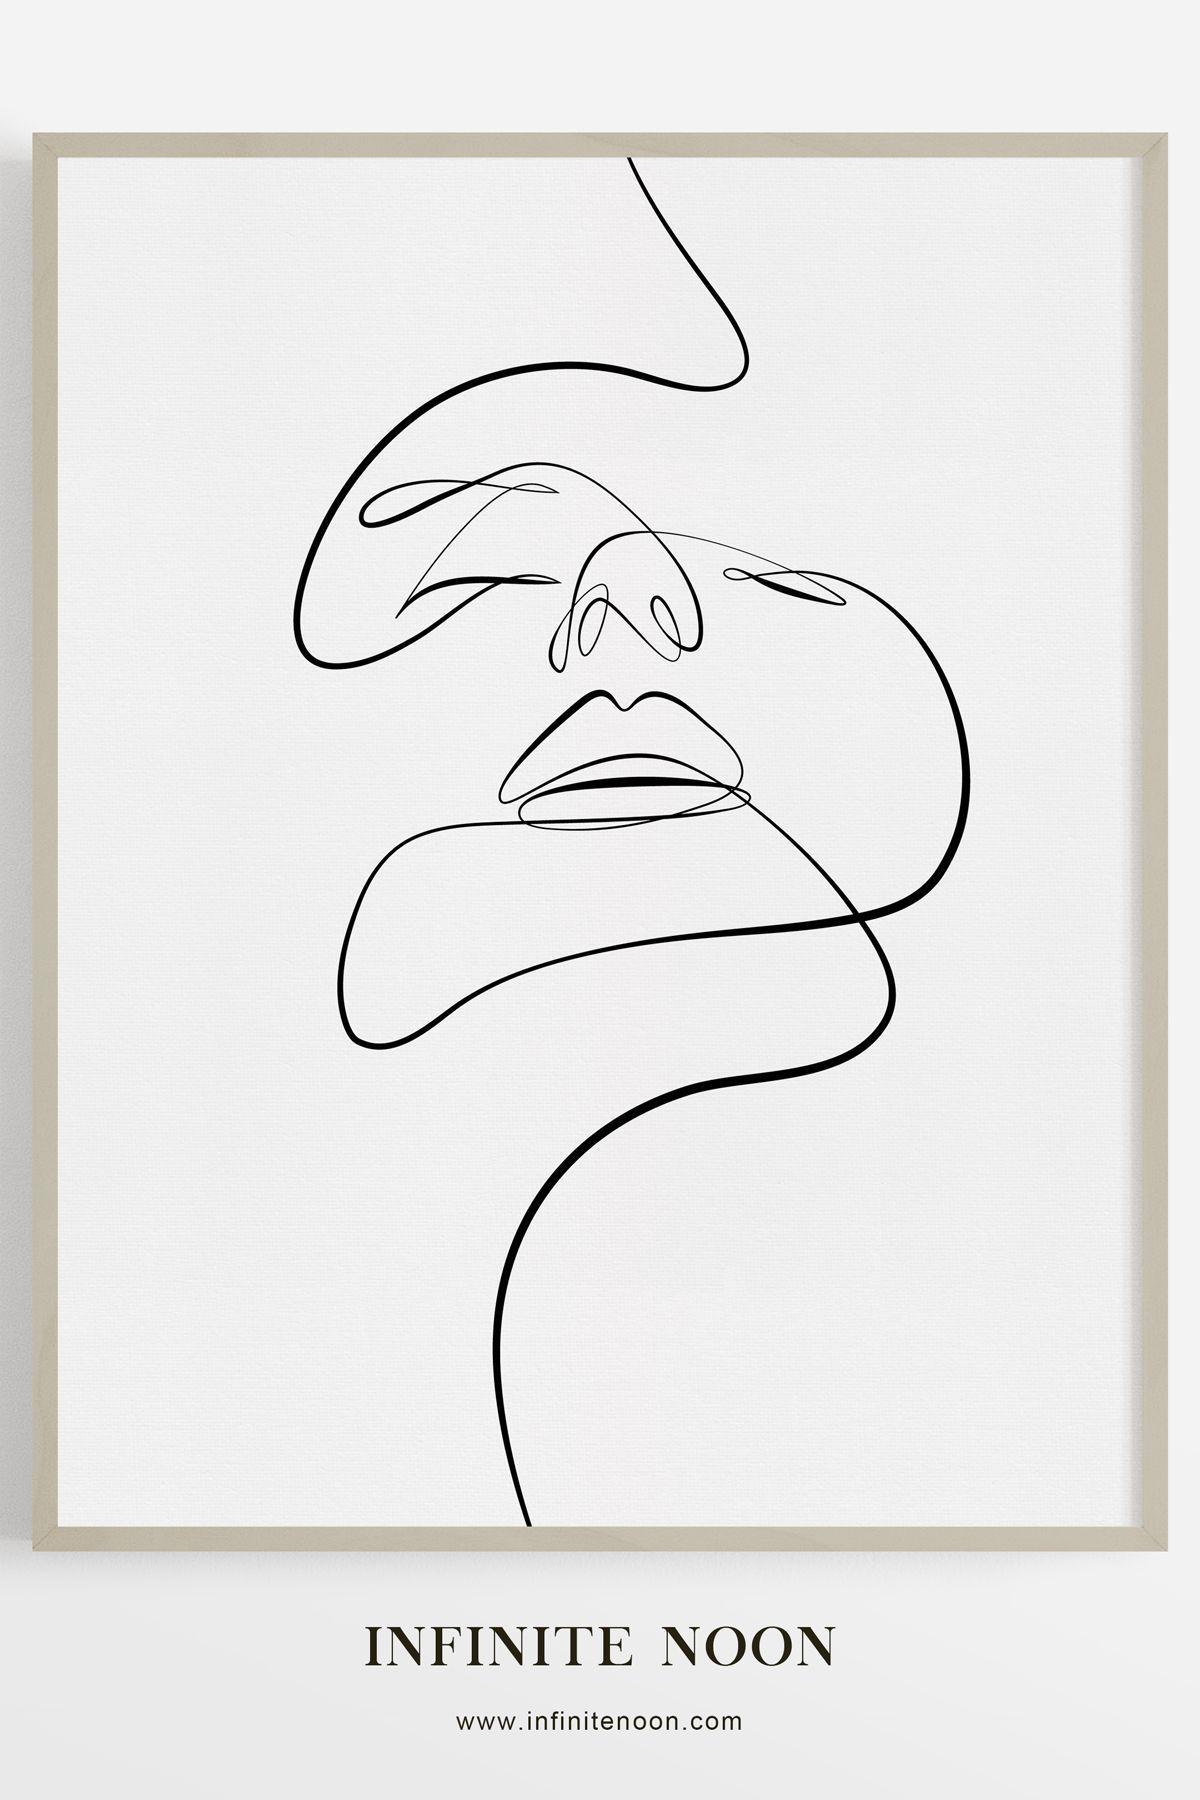 Unravel Abstraktezeichnungen Abstract Face Doodle Drawing Print Simplistic Lin Unravel Abstraktezeichnun Face Doodles Line Art Drawings Abstract Line Art